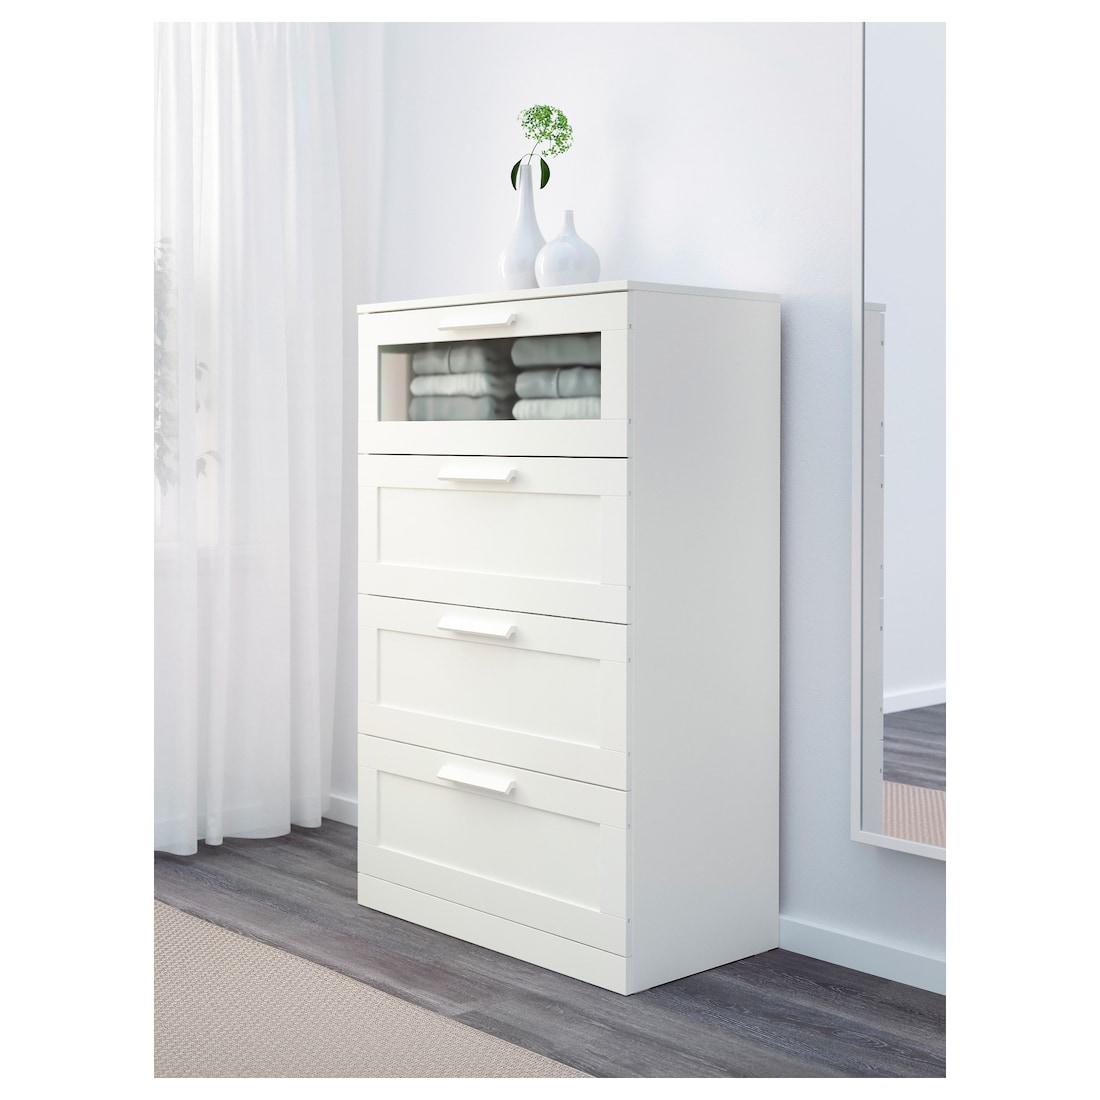 Ikea Brimnes Kommode 2021